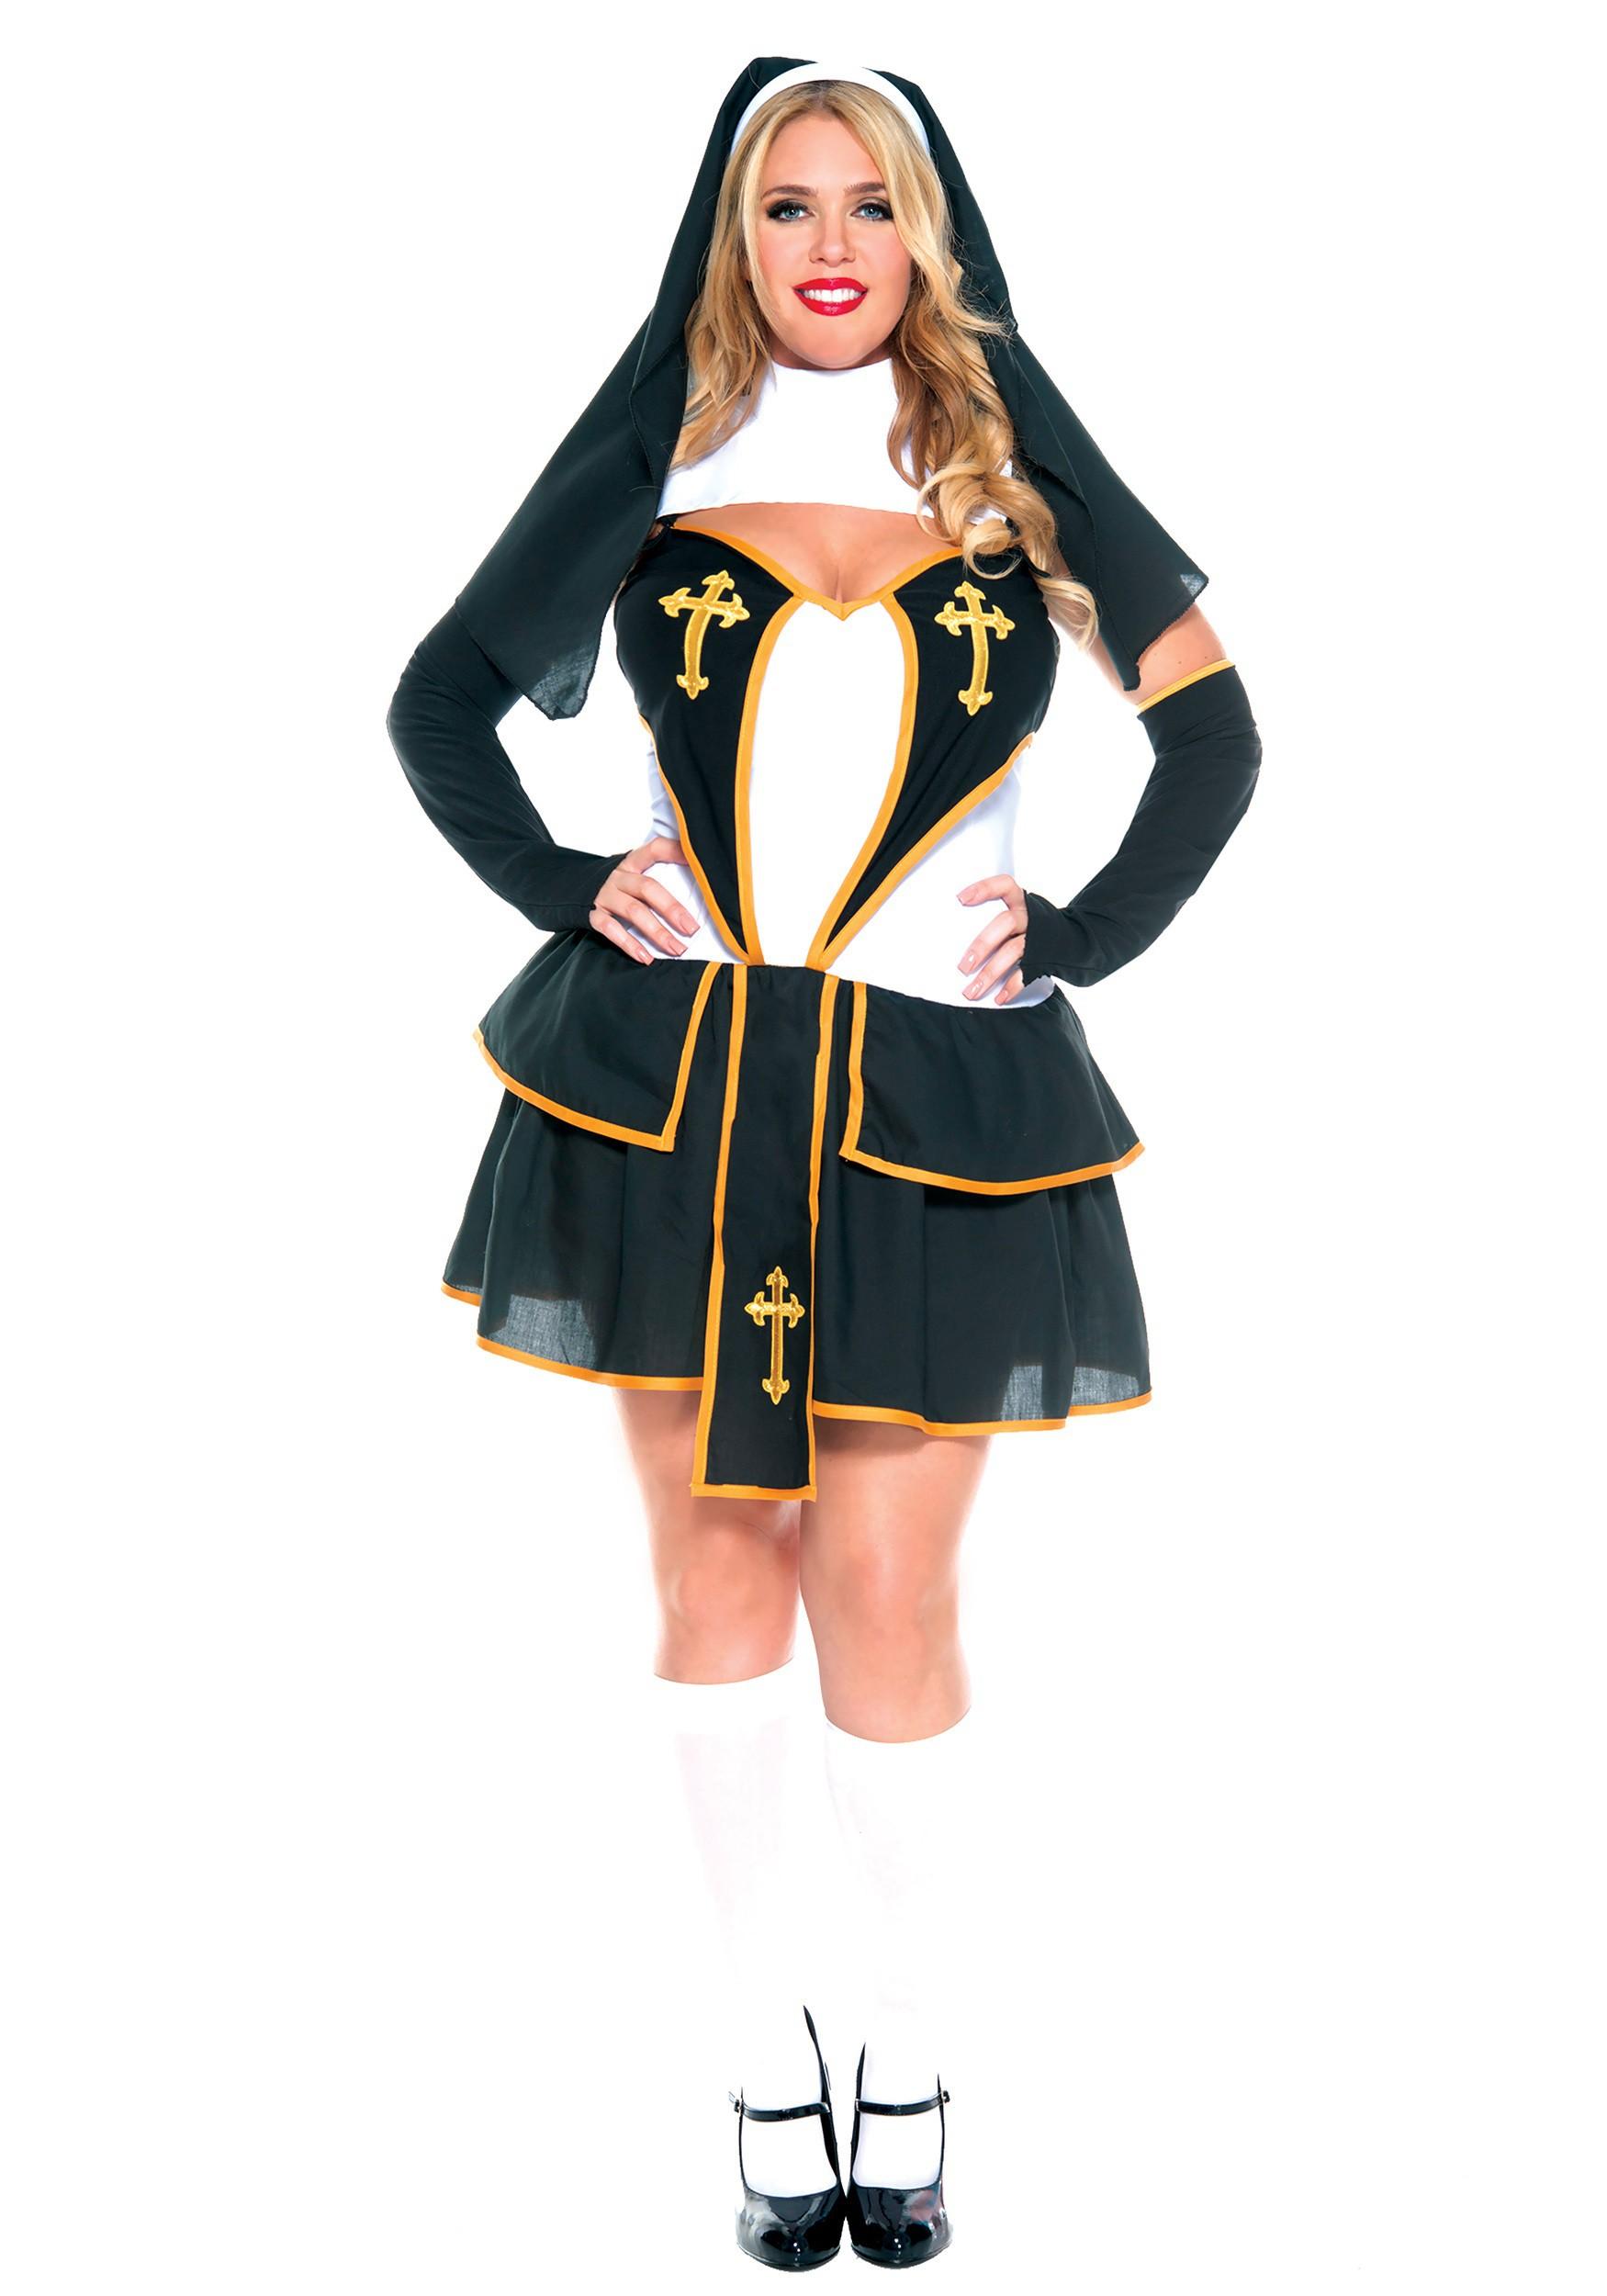 women's plus size flirty nun costume 1x/2x 3x/4x